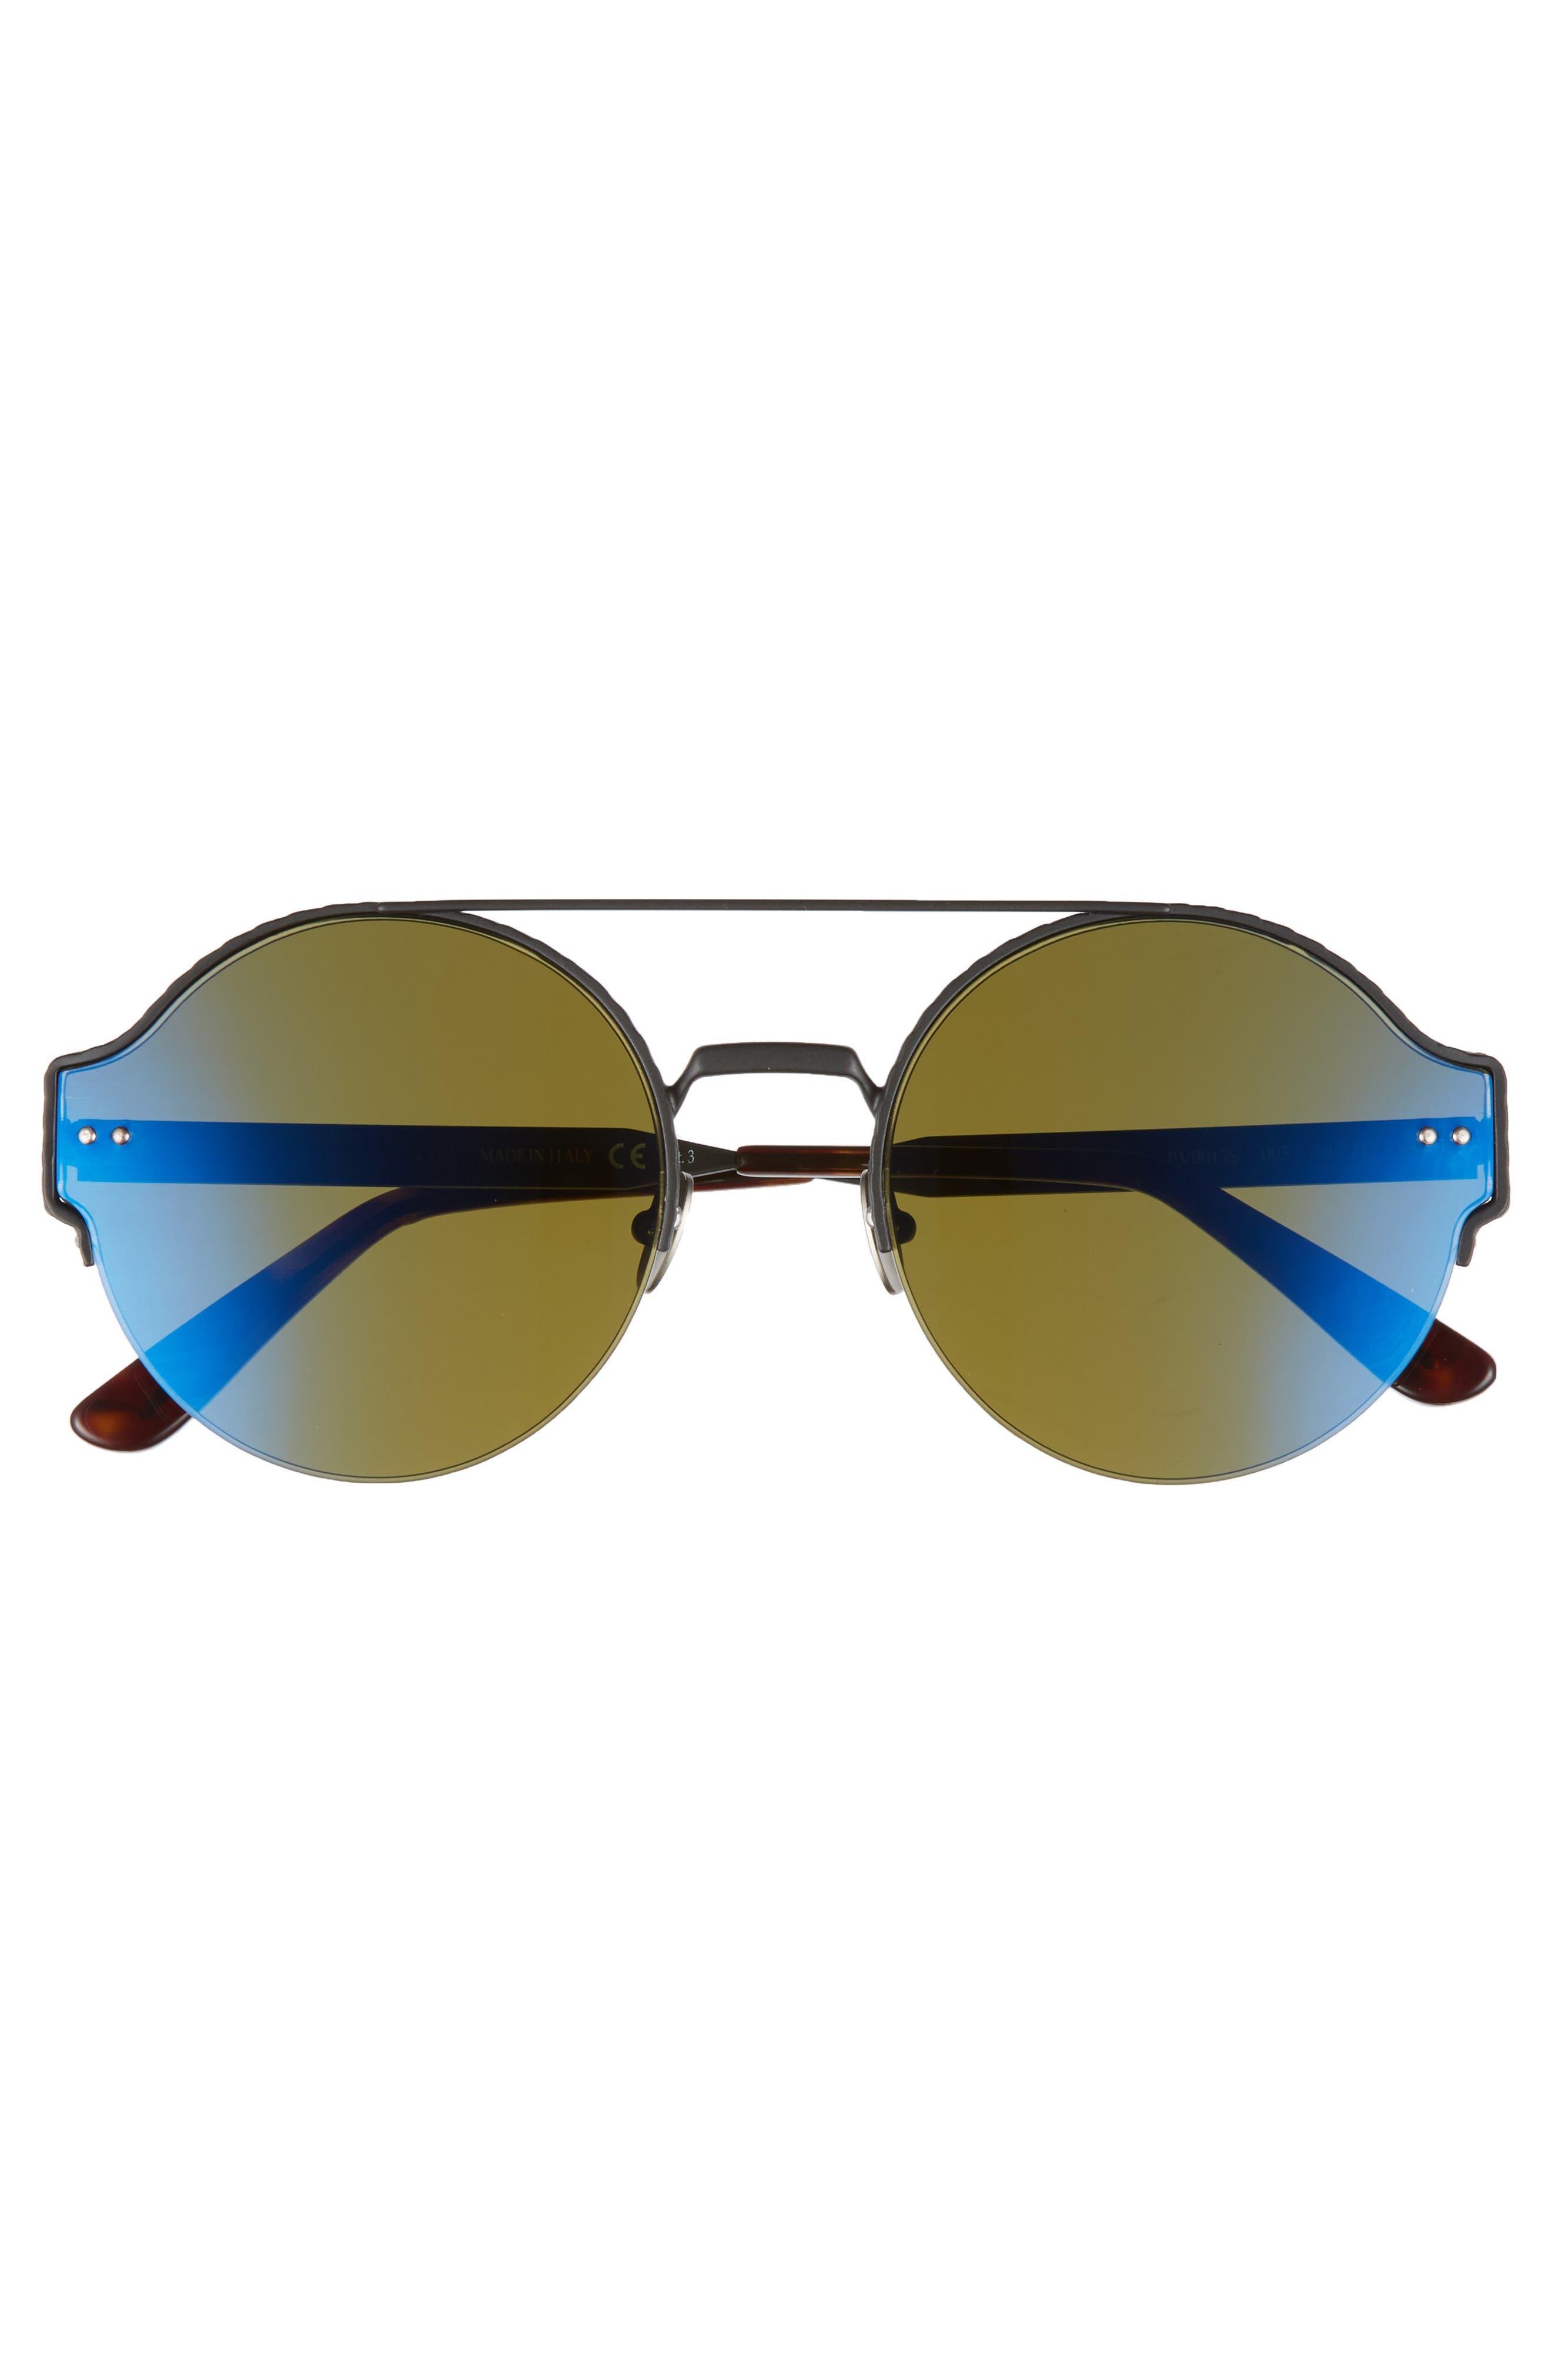 54mm Round Semi-Rimless Sunglasses,                             Alternate thumbnail 7, color,